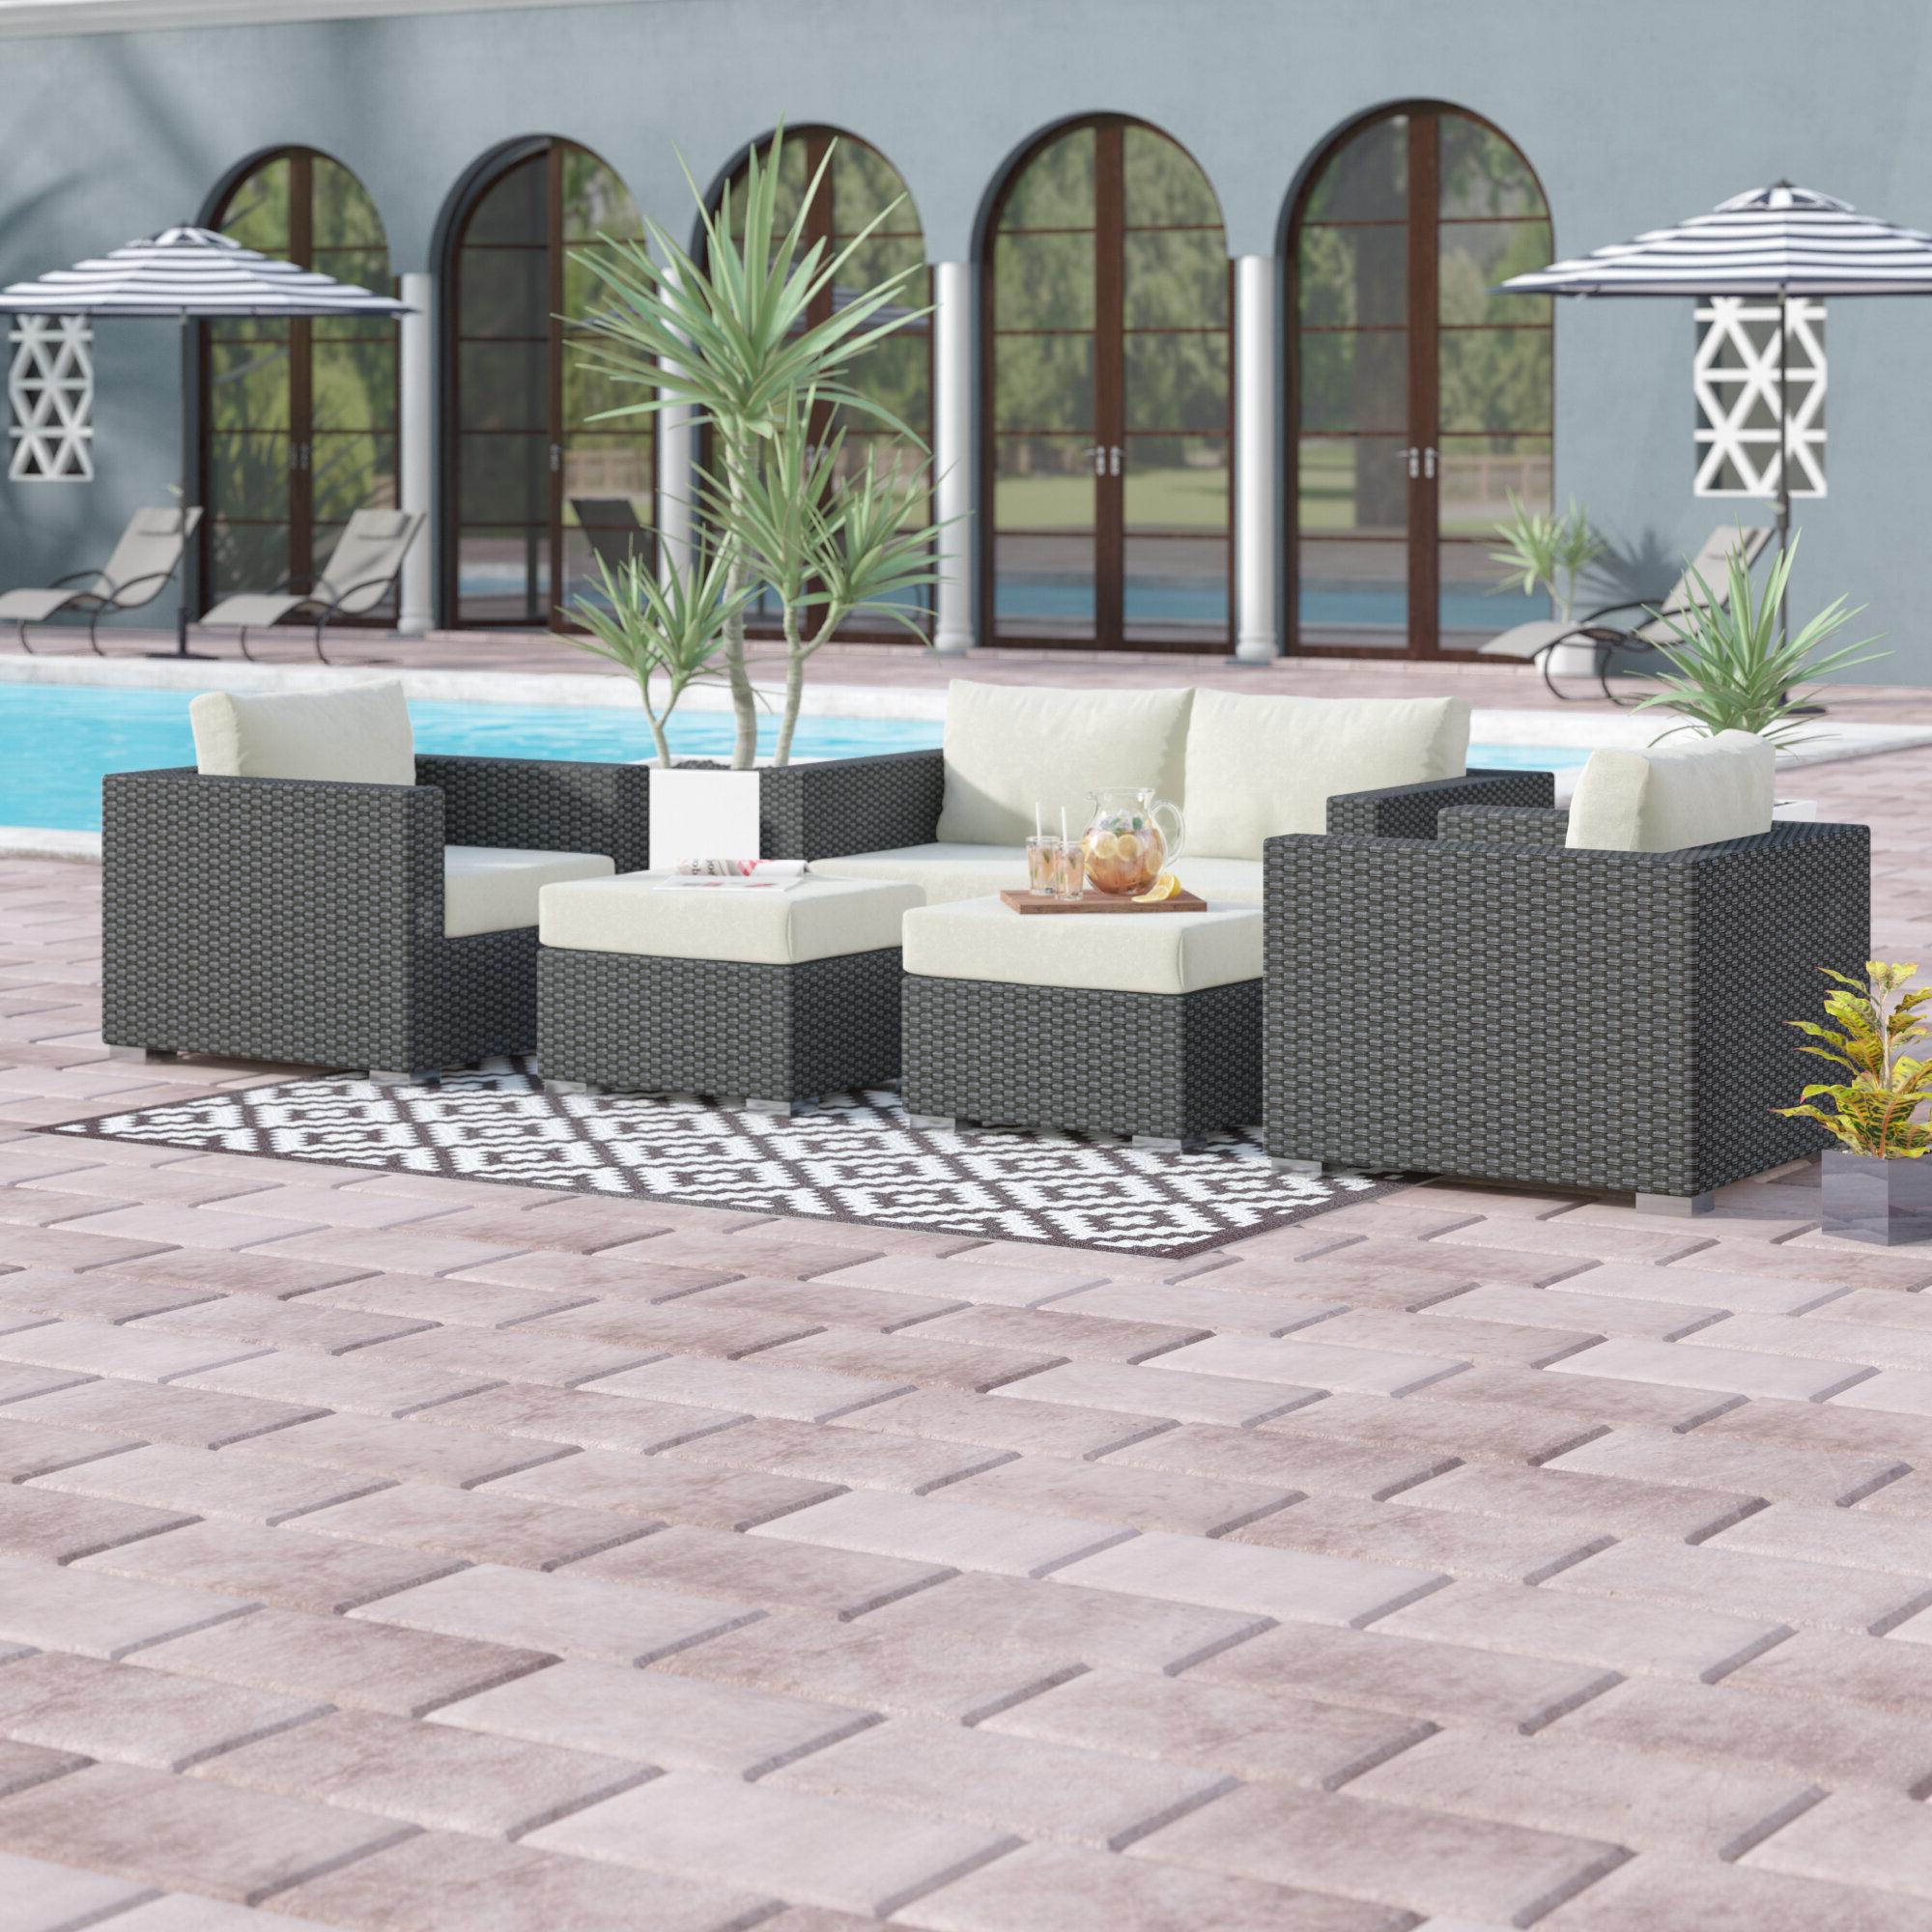 2019 Tripp Sofa With Cushions Regarding Tripp 5 Piece Sunbrella Sofa Set With Cushions (Gallery 6 of 20)